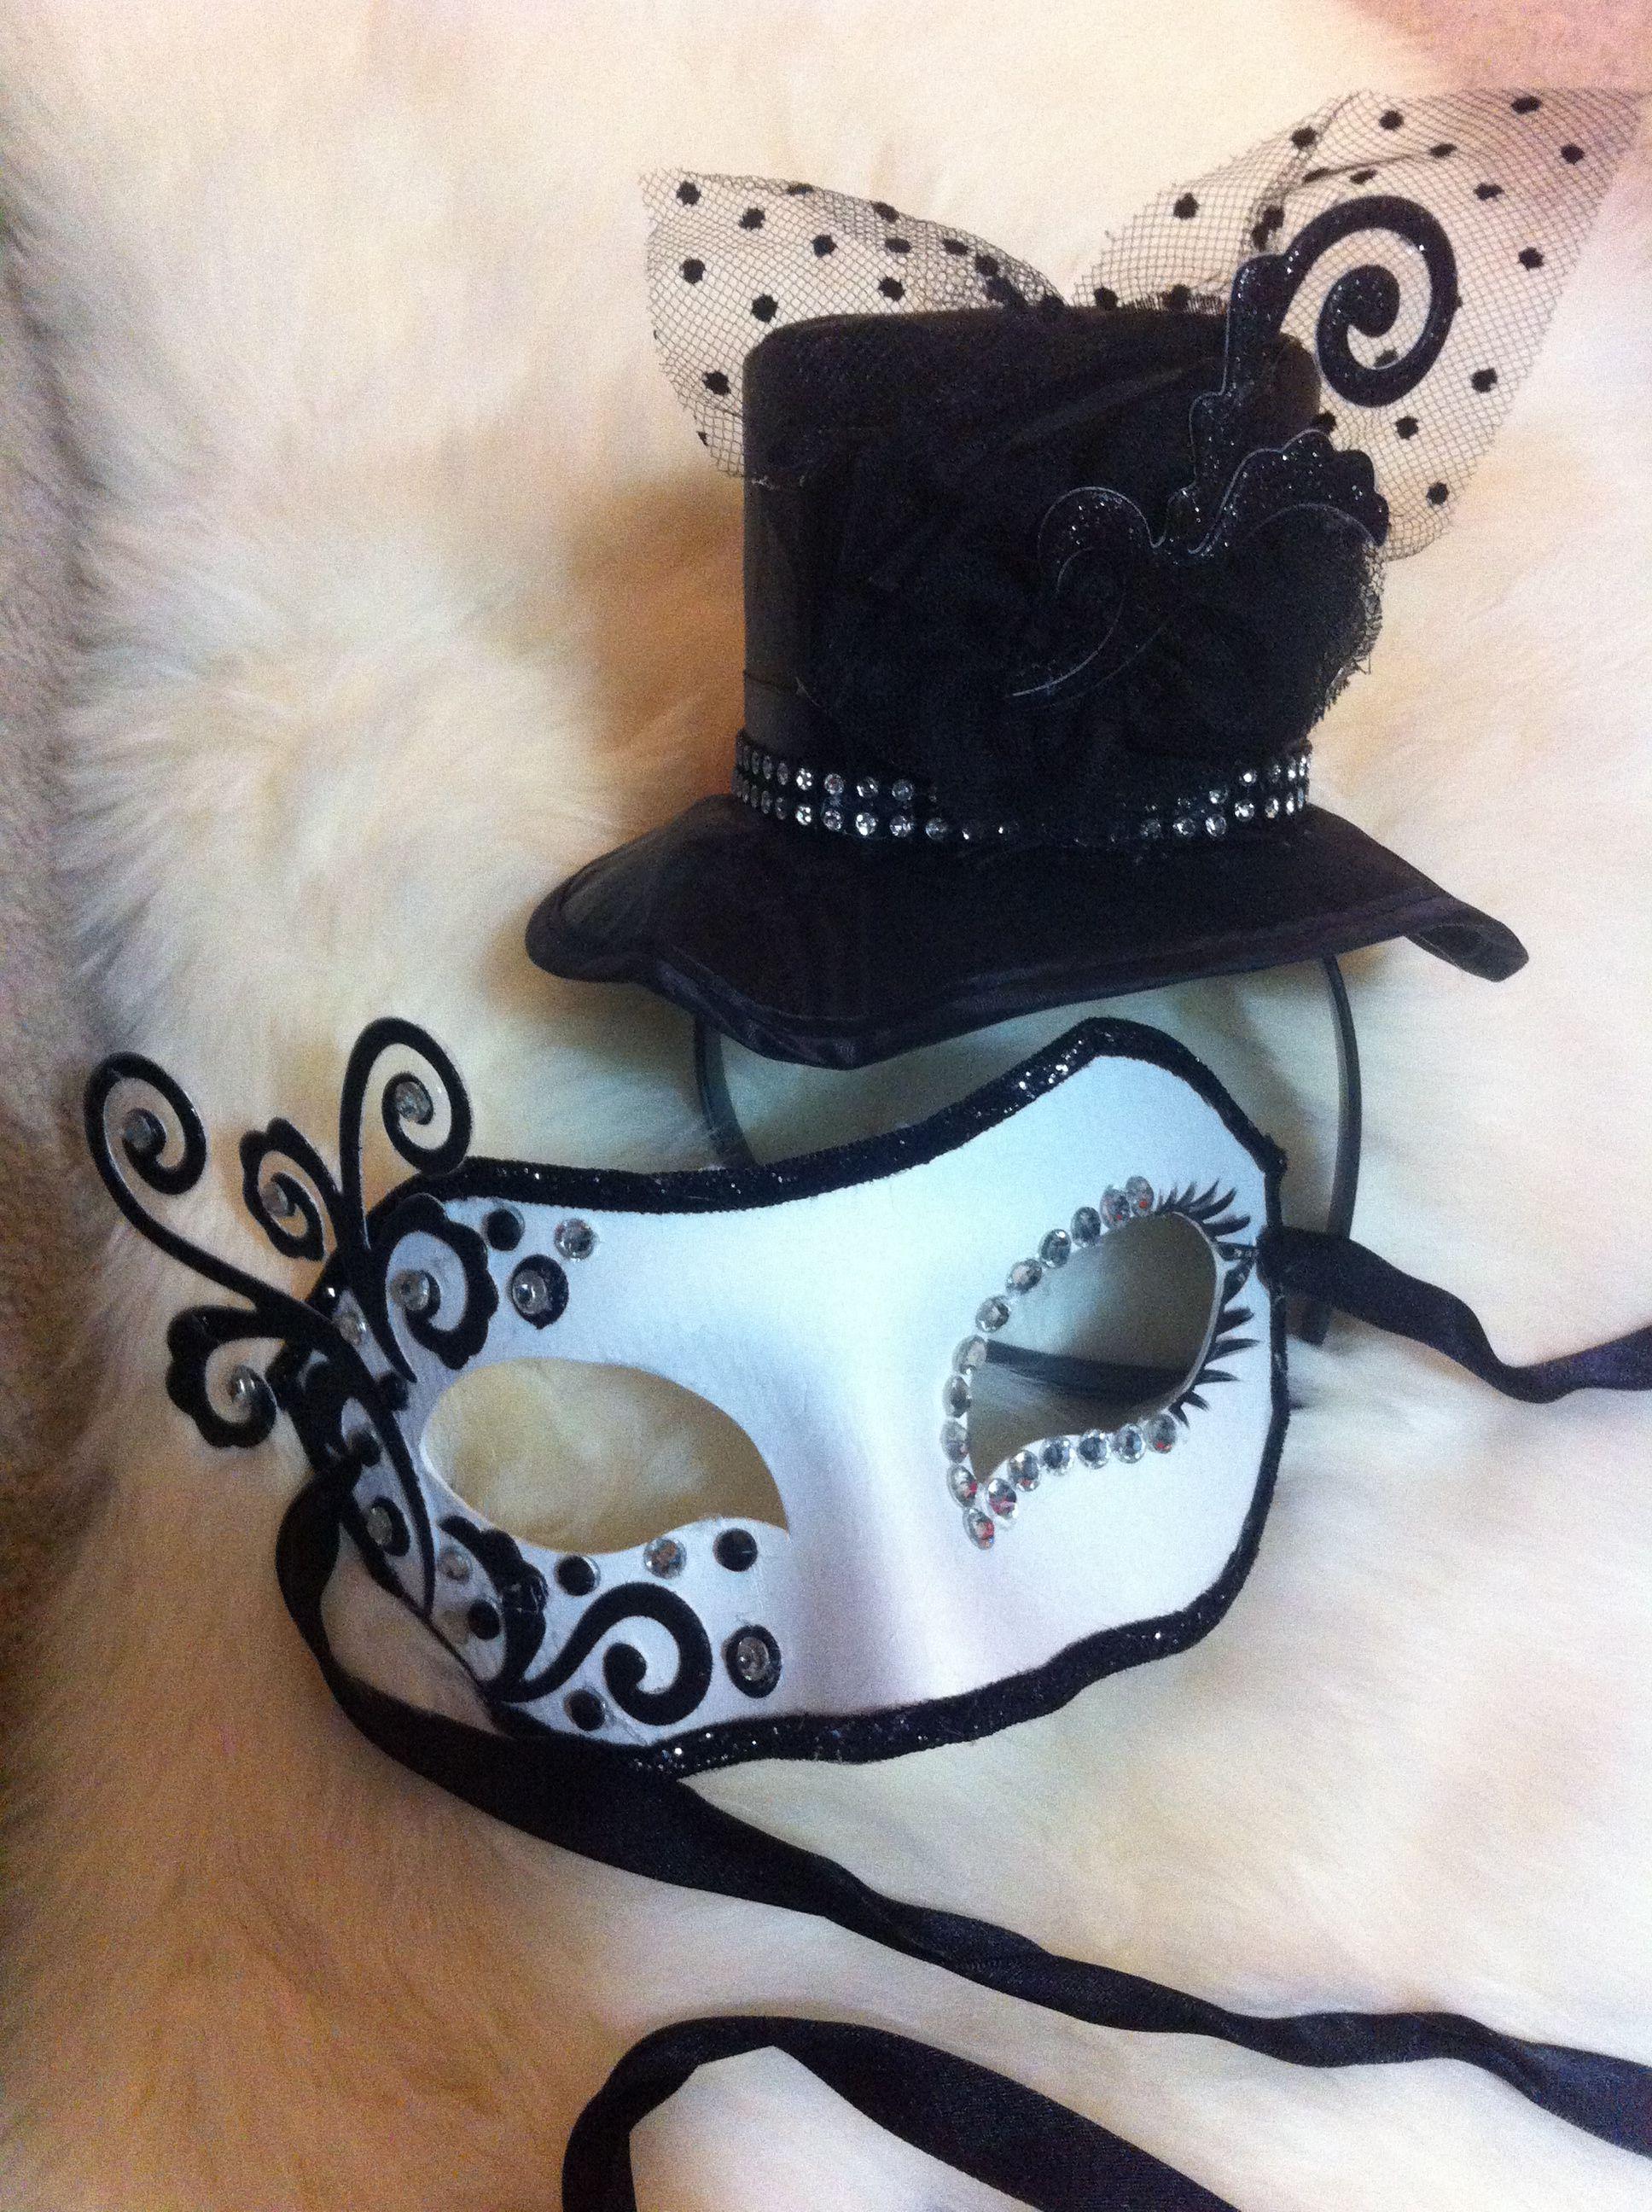 Pin By Korie Weston On Masquerade Masquerade Mask Diy Masks Masquerade Masquerade Costumes